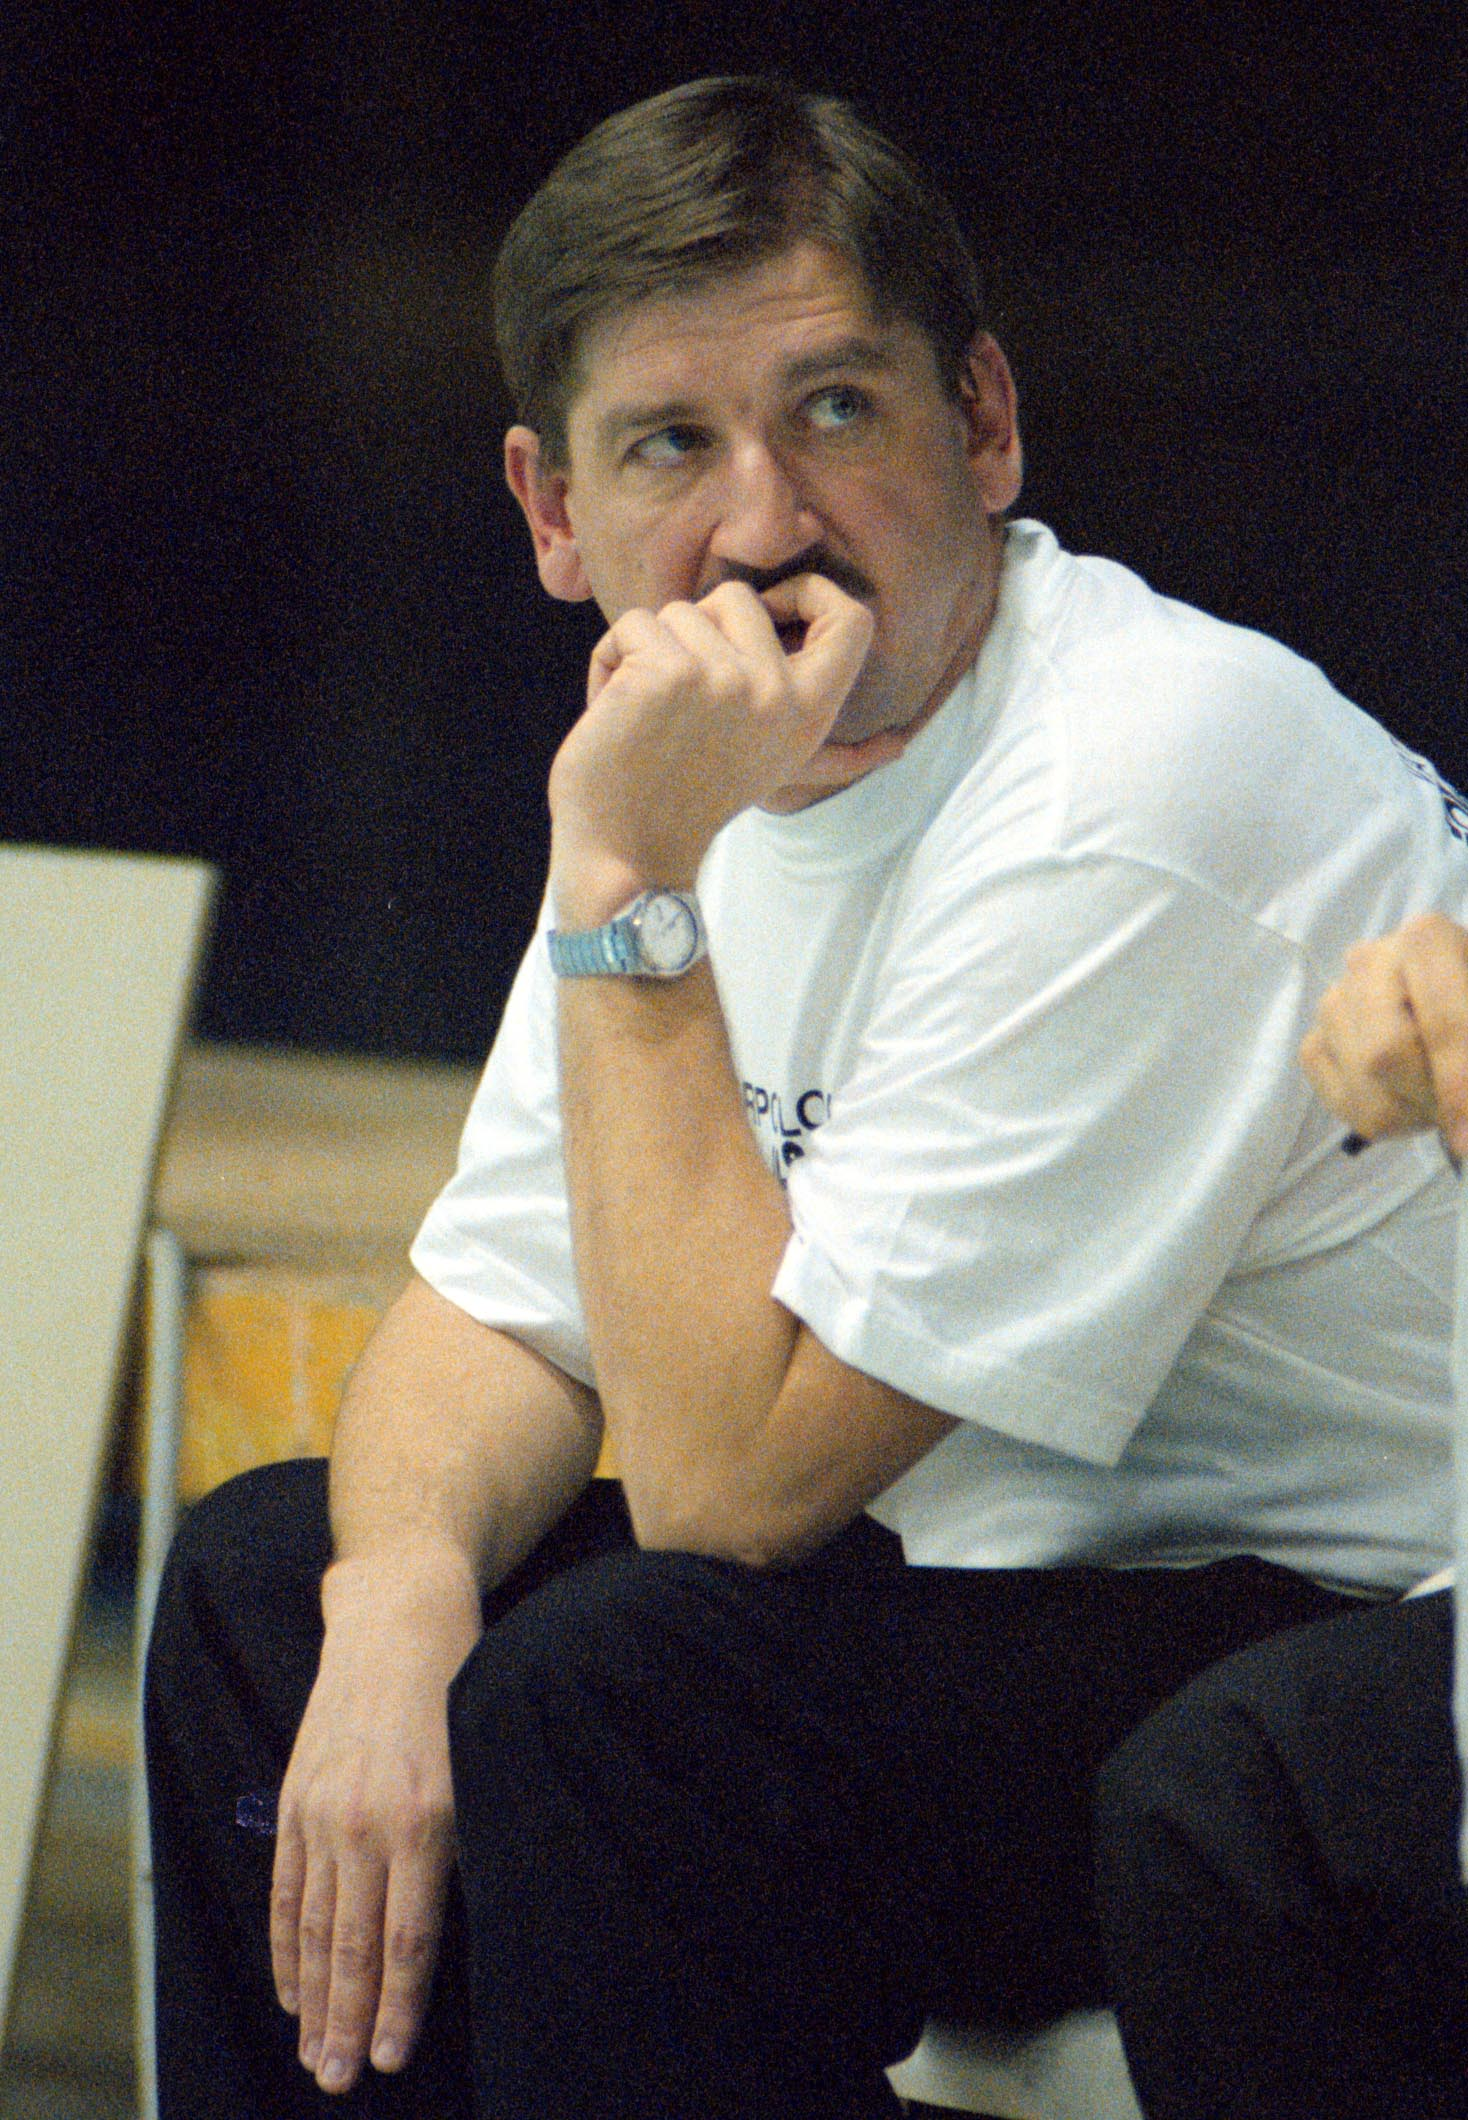 2000. (12.02.) Nenad Manojlovic, trener vaterpolista Partizana